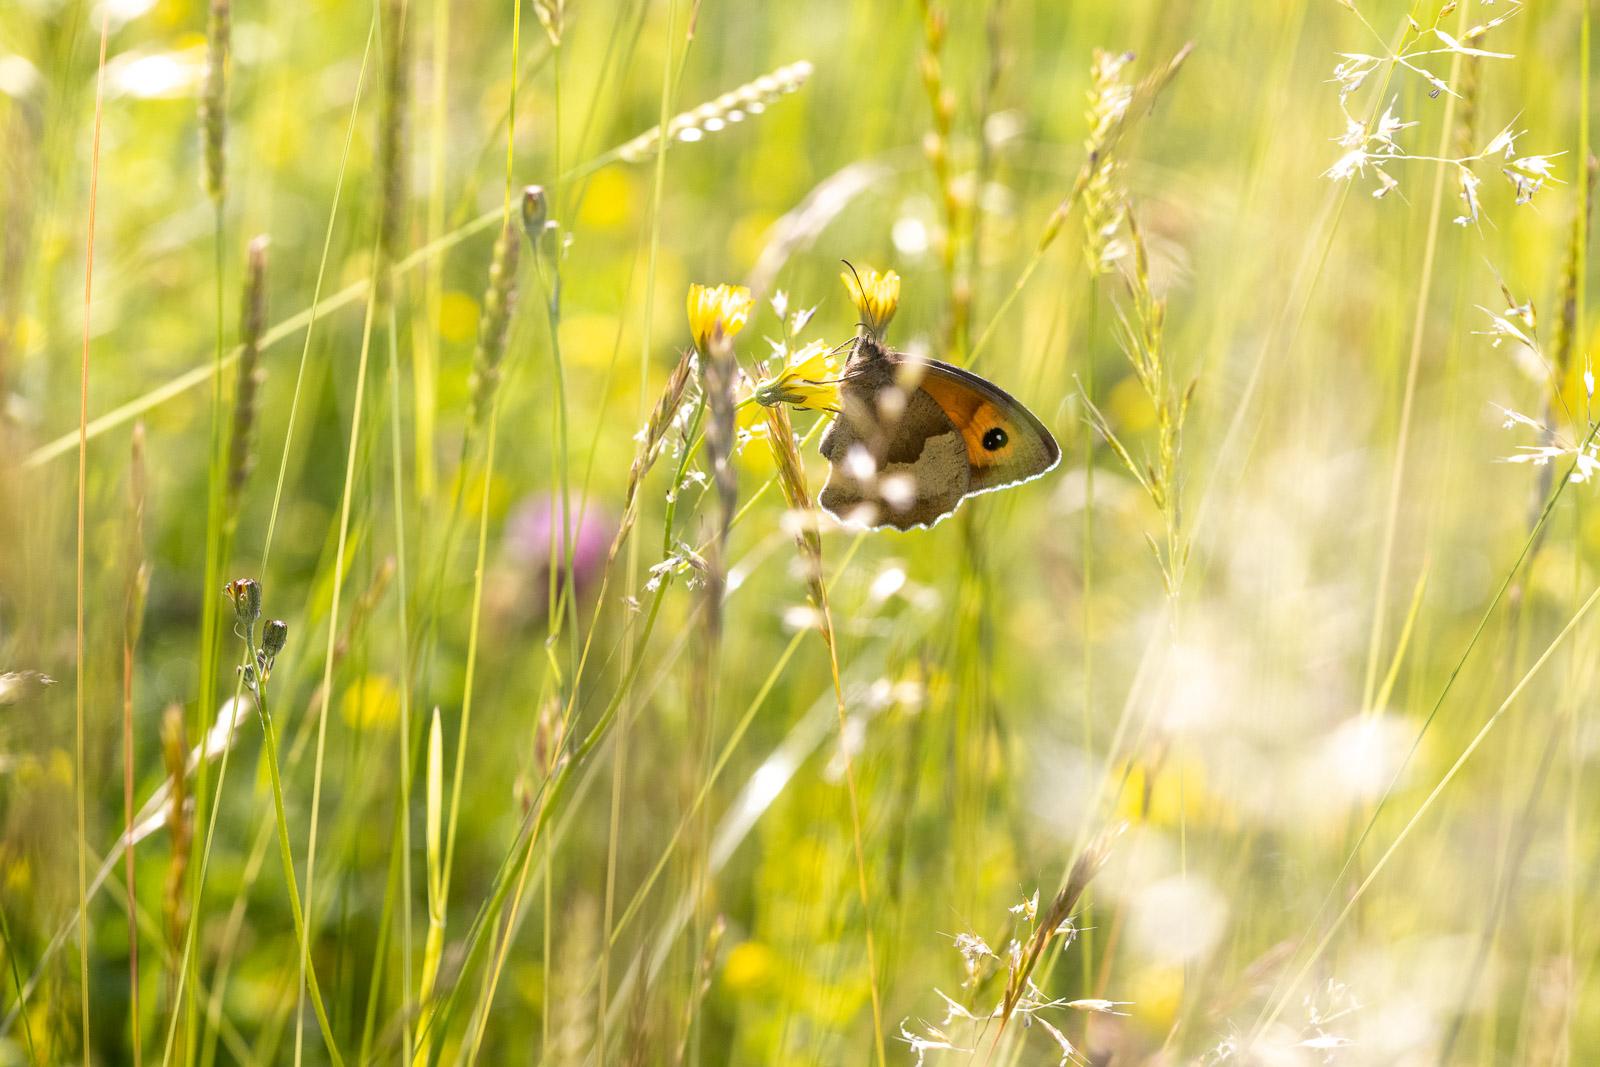 Meadow Brown (Maniola jurtina) - Collard Hill, Nr Street, Somerset, UK. ID BR59192